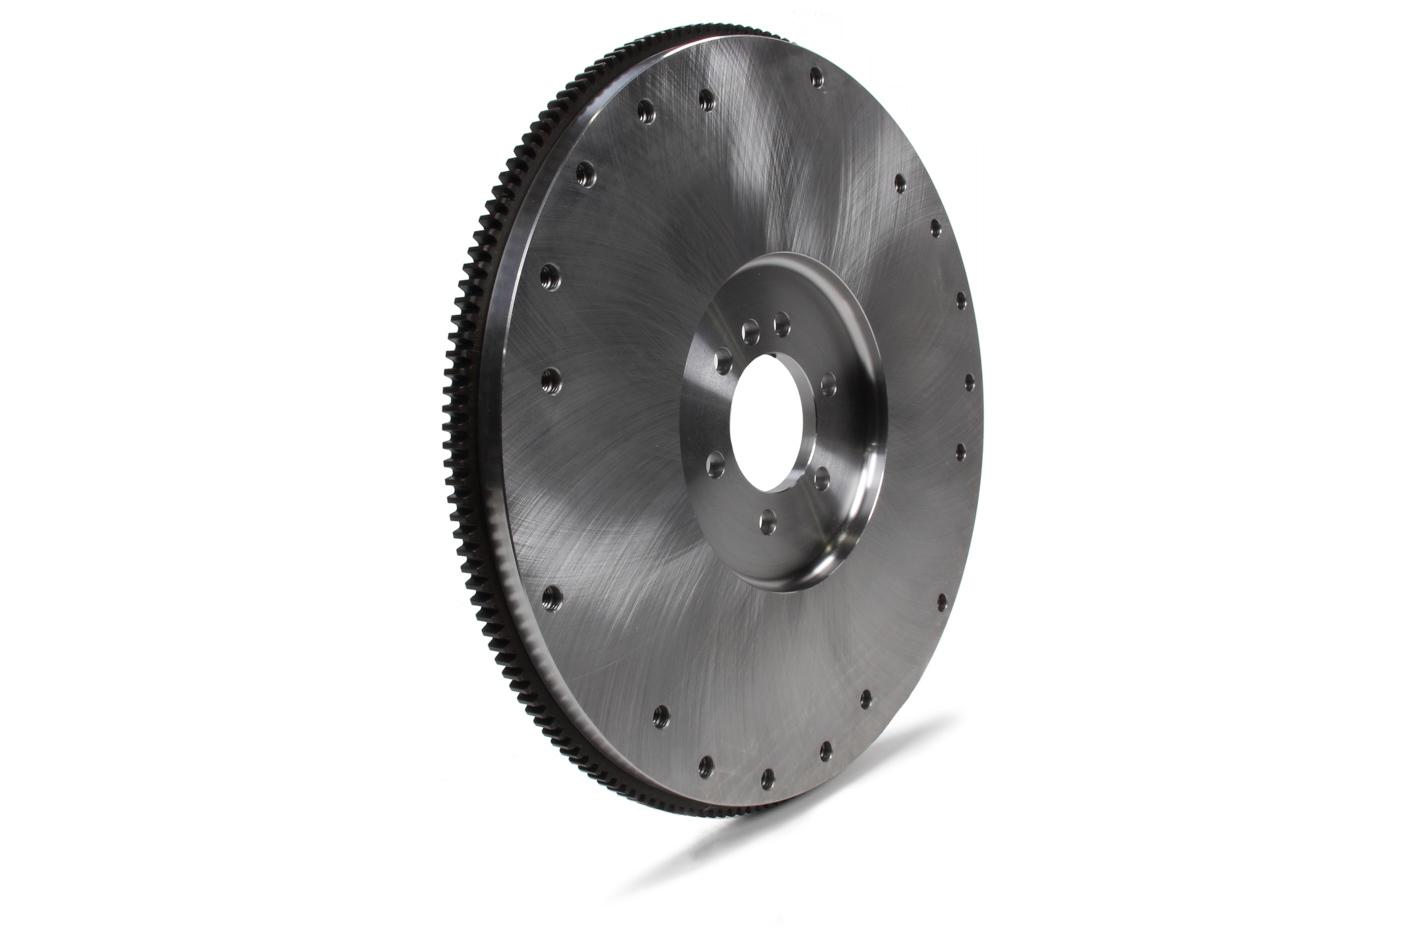 Ram Clutch 1523LW Flywheel, 168 Tooth, 25 lb, SFI 1.1, Steel, Natural, External Balance, Small Block Chevy, Each